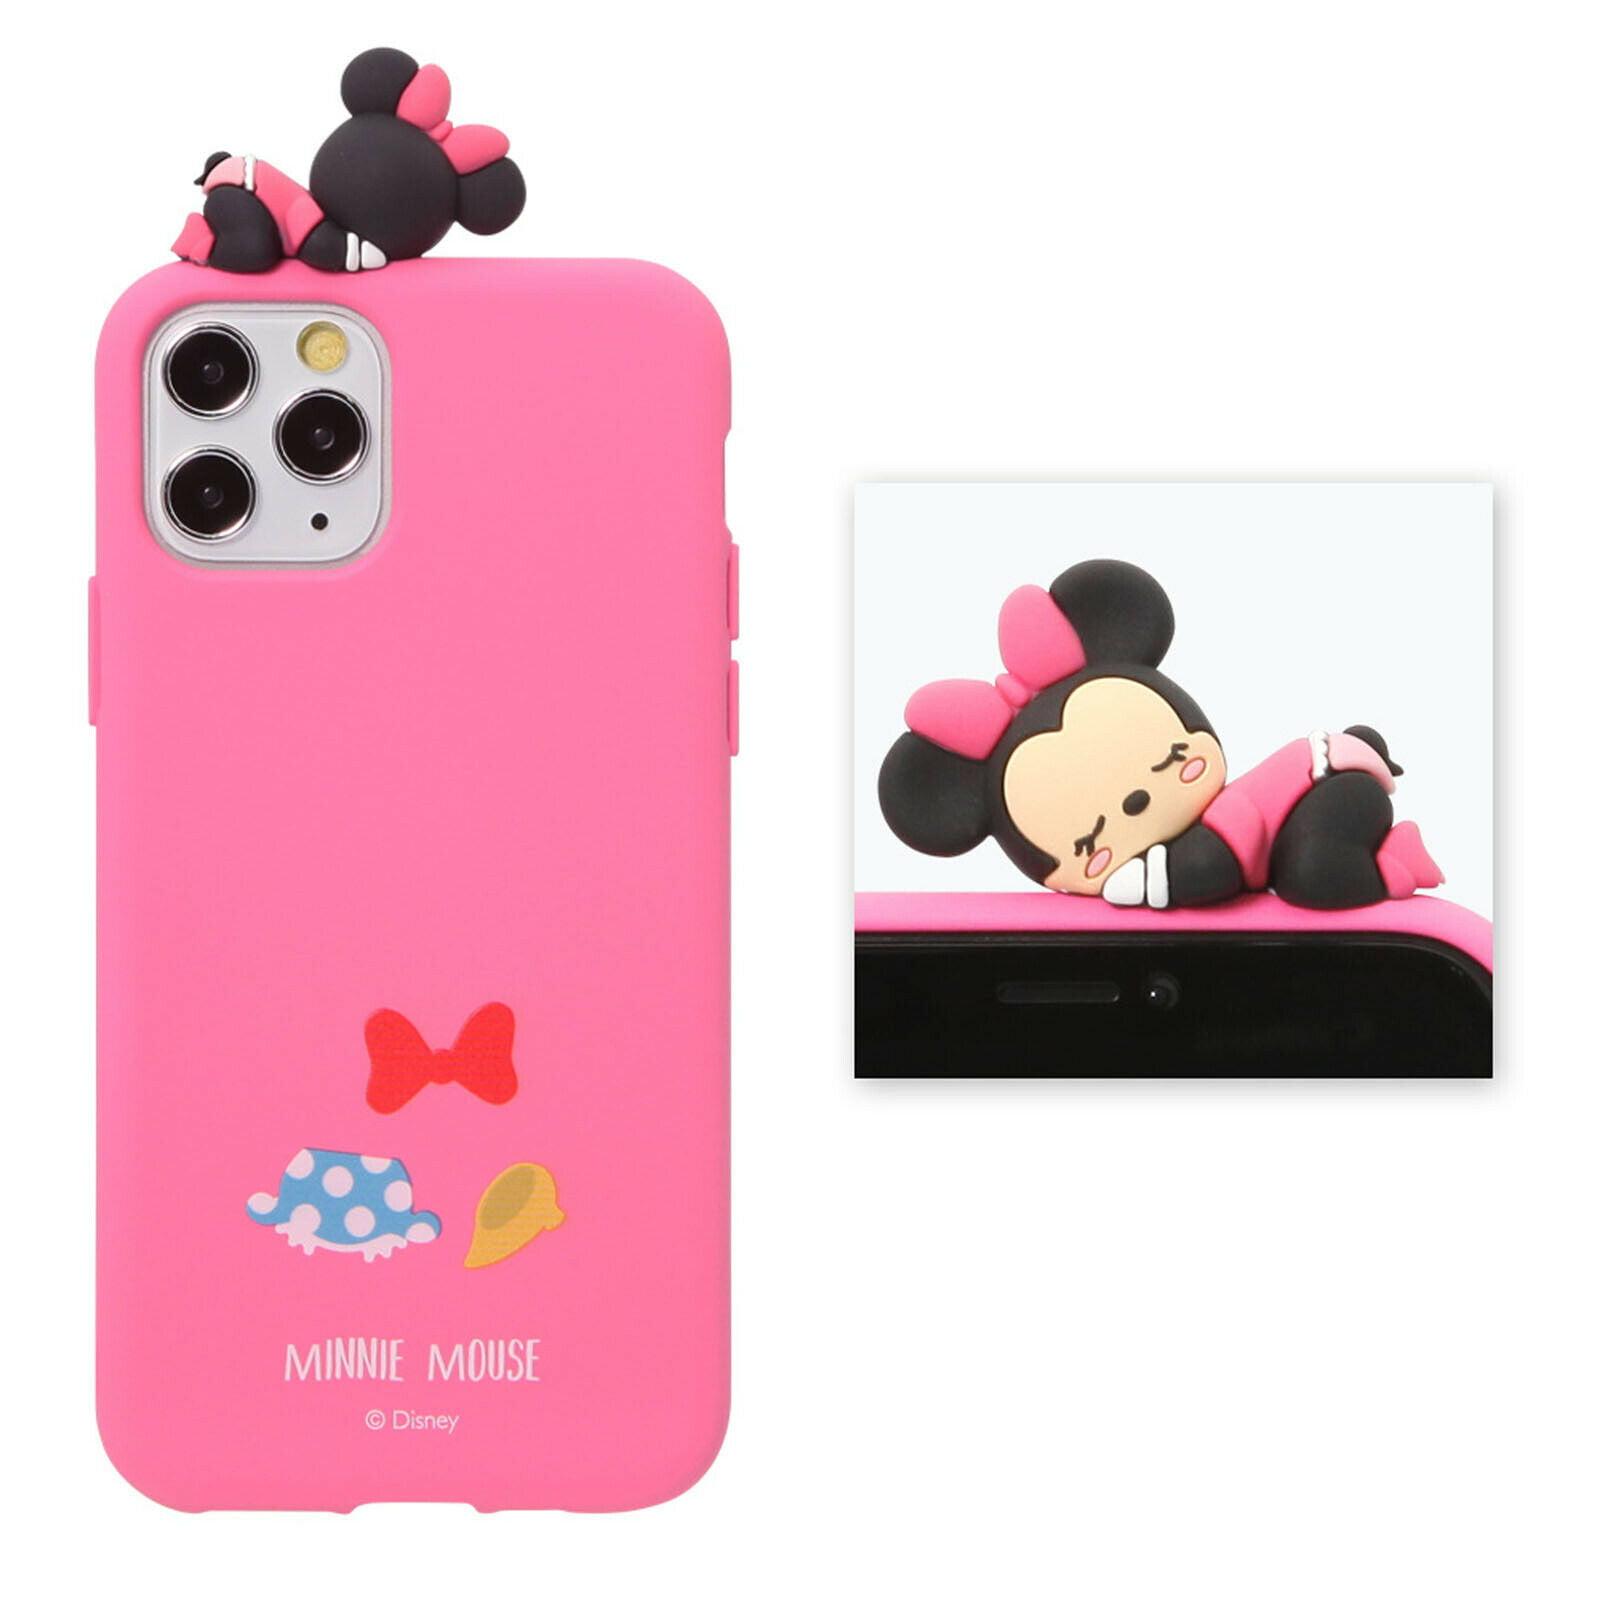 Disney Minnie Mouse Sleep Figure Jell Slim Protective Rubber Phone Case Cover For Iphone 11 Pro Max Walmart Com Walmart Com